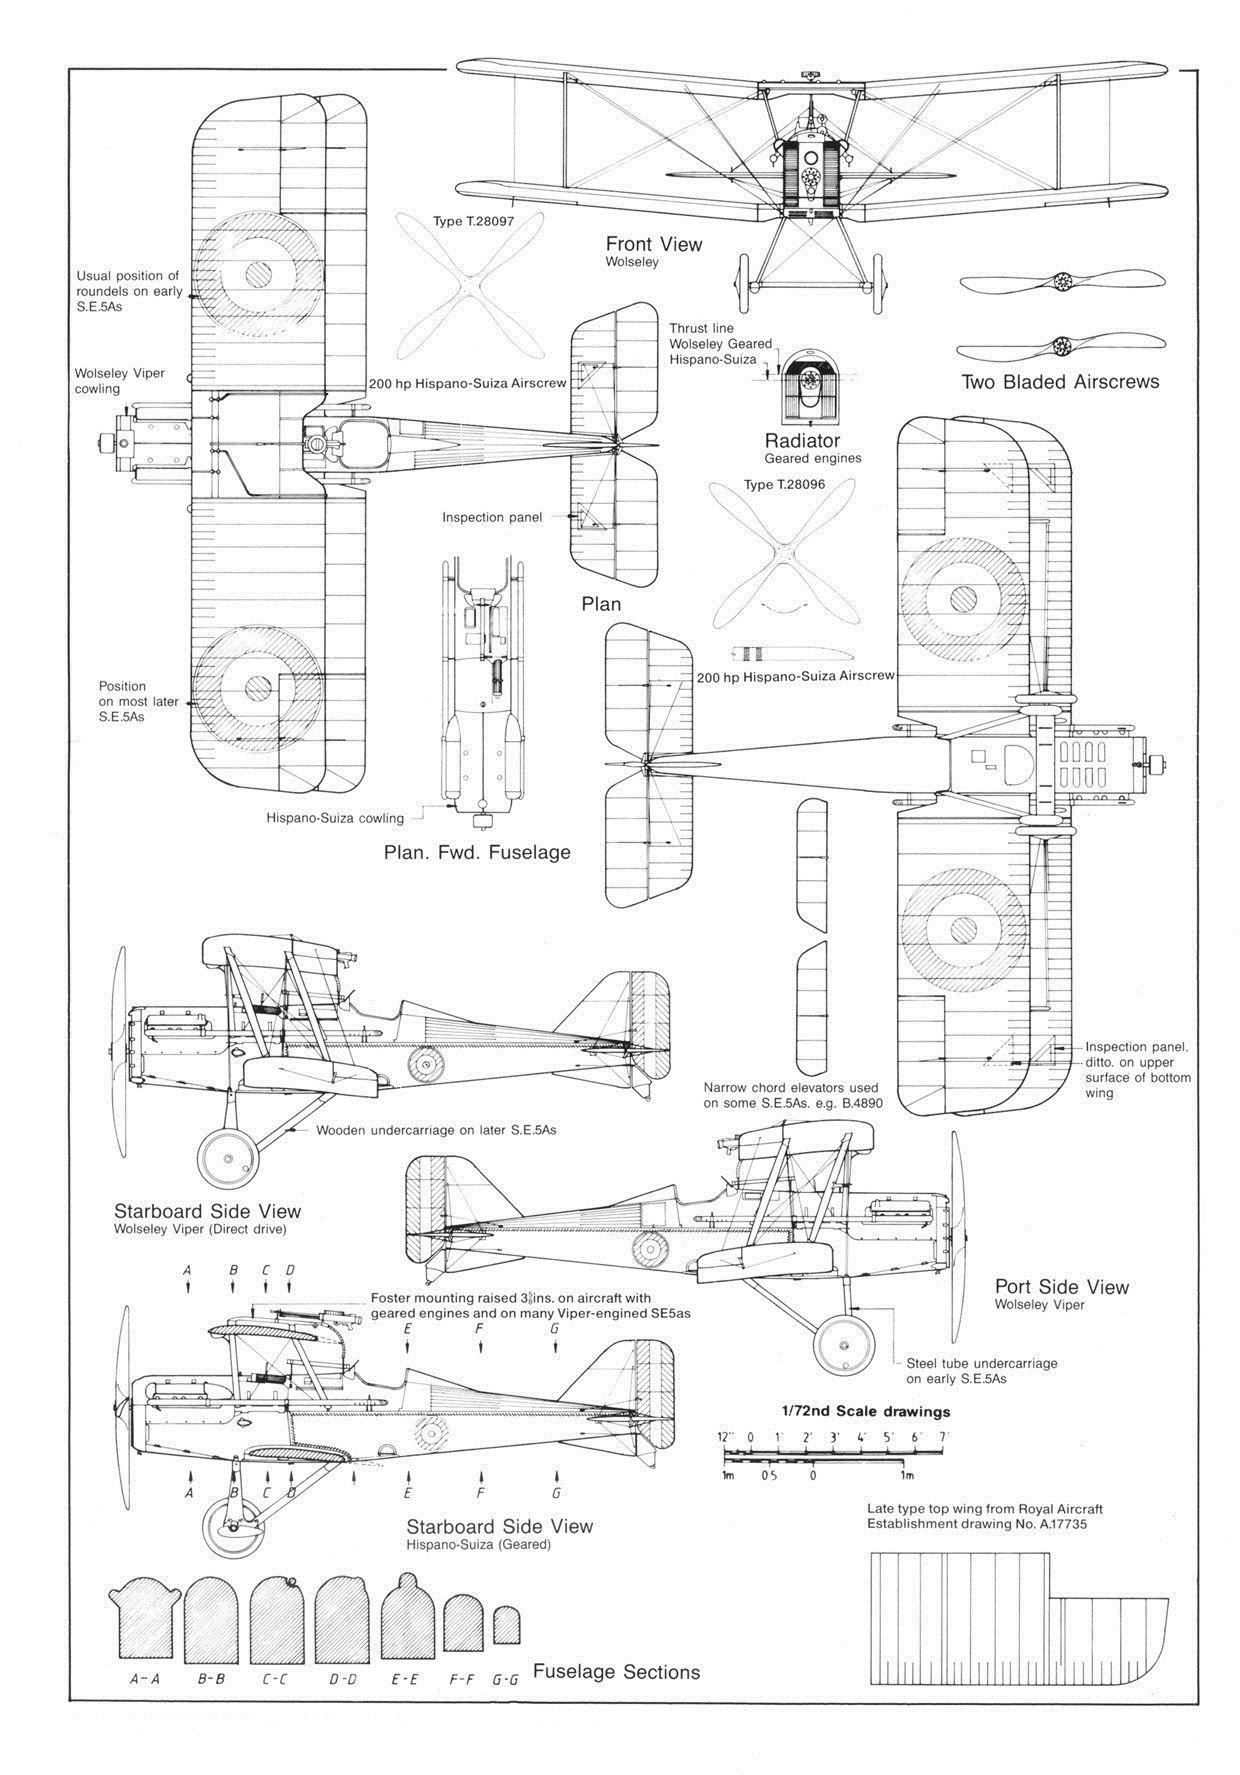 Se5a Drawing